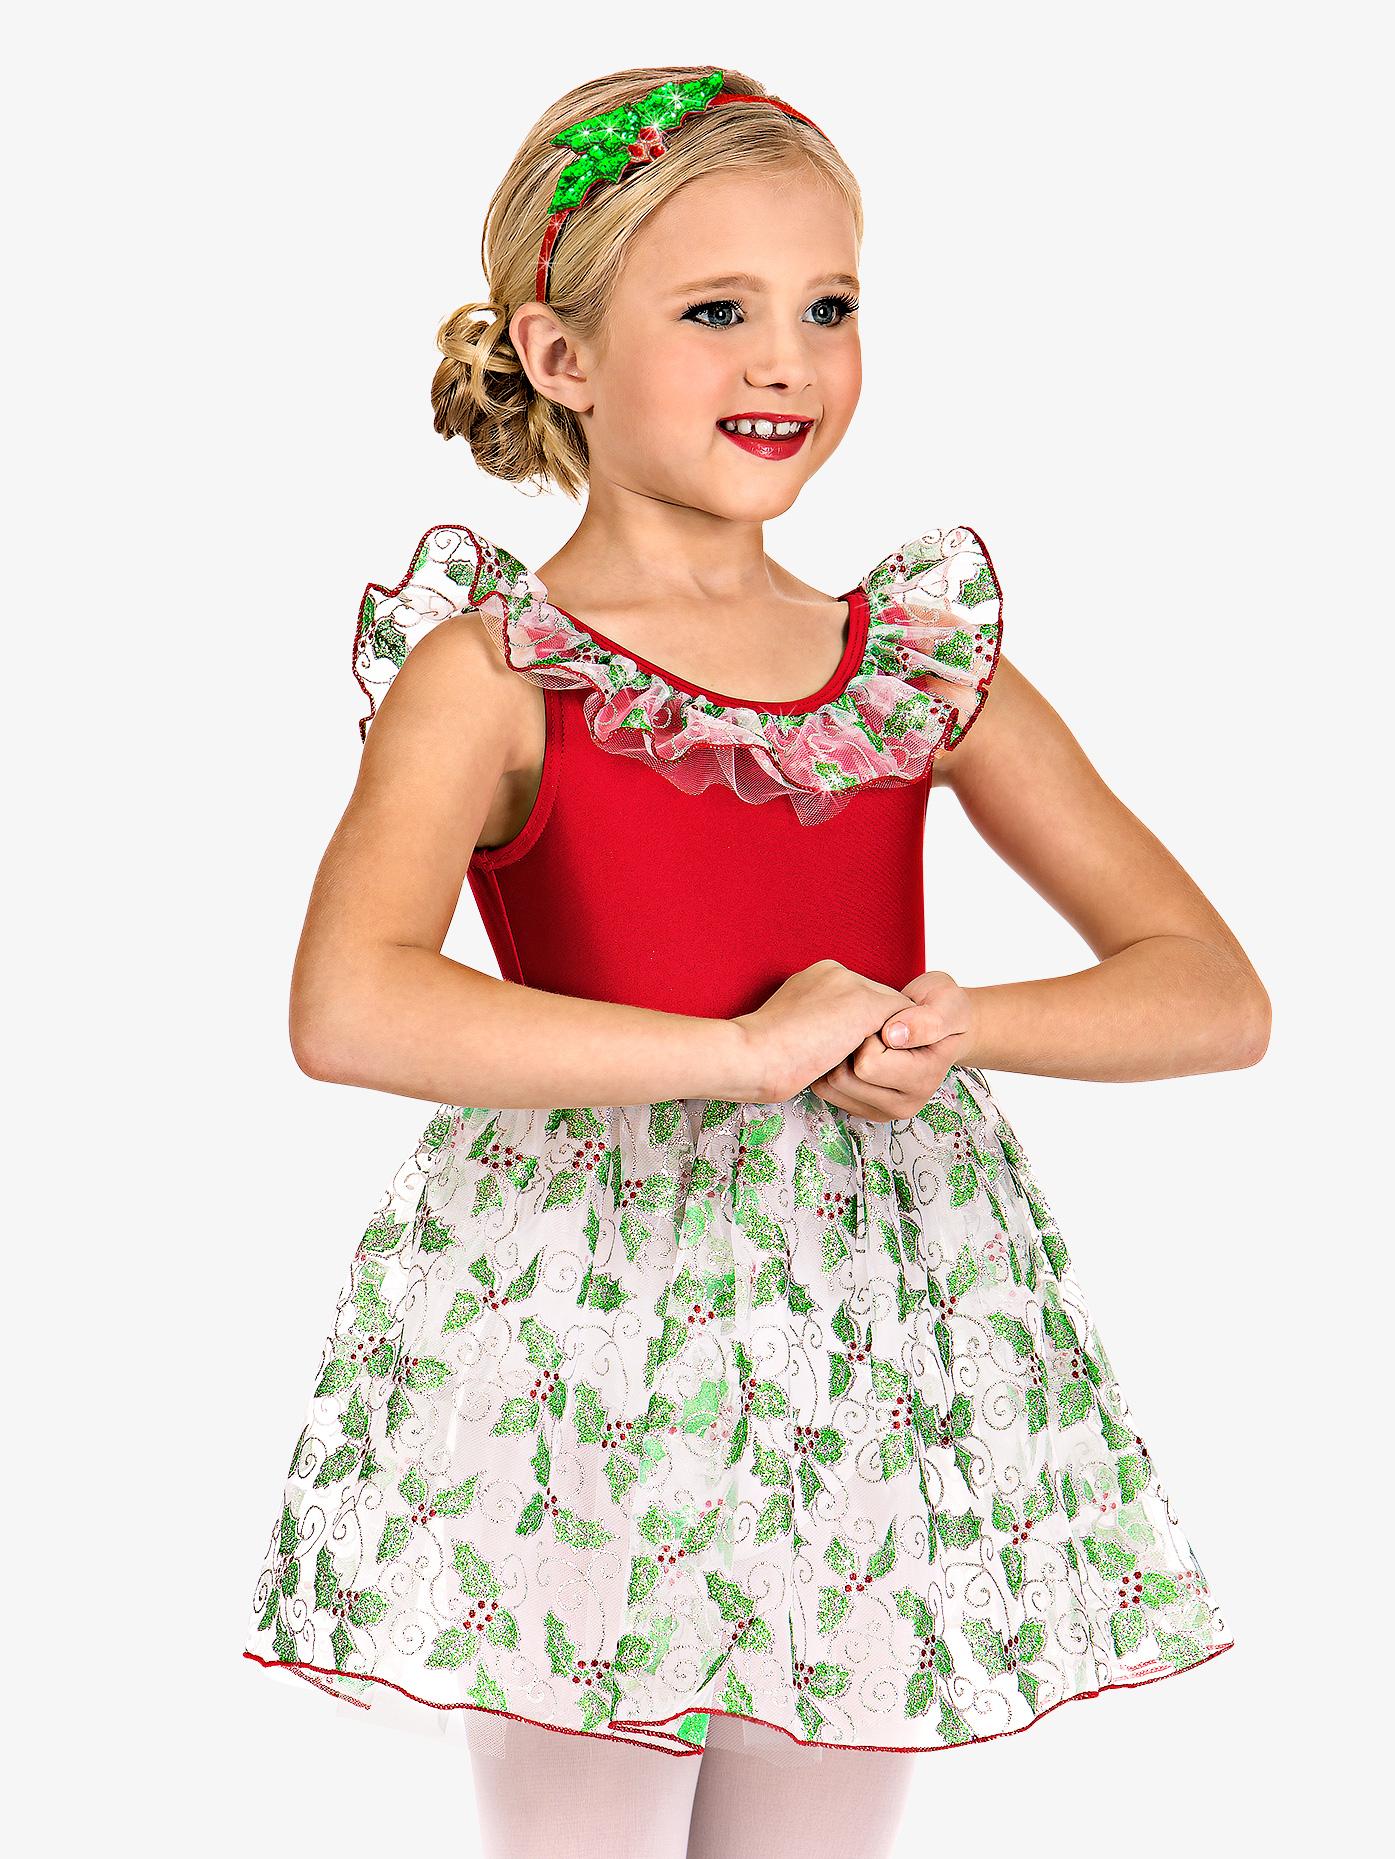 Double Platinum Girls Holly Print Tank Dress Set N7506C